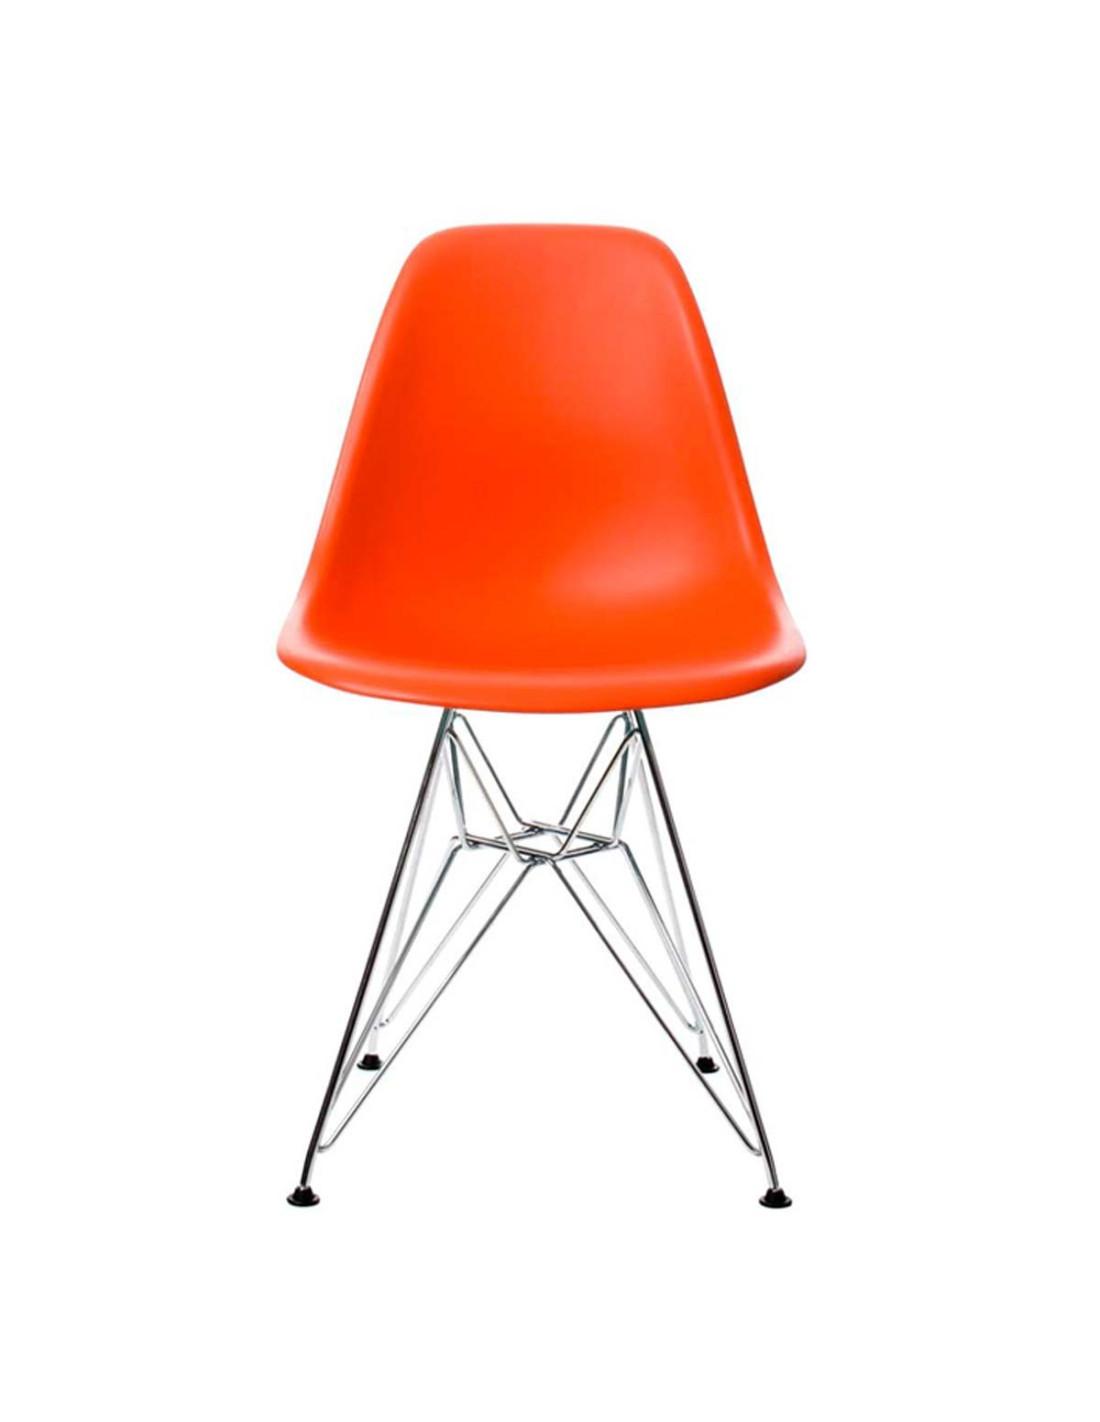 chaise dsr design charles ray eames pour vitra la boutique danoise. Black Bedroom Furniture Sets. Home Design Ideas